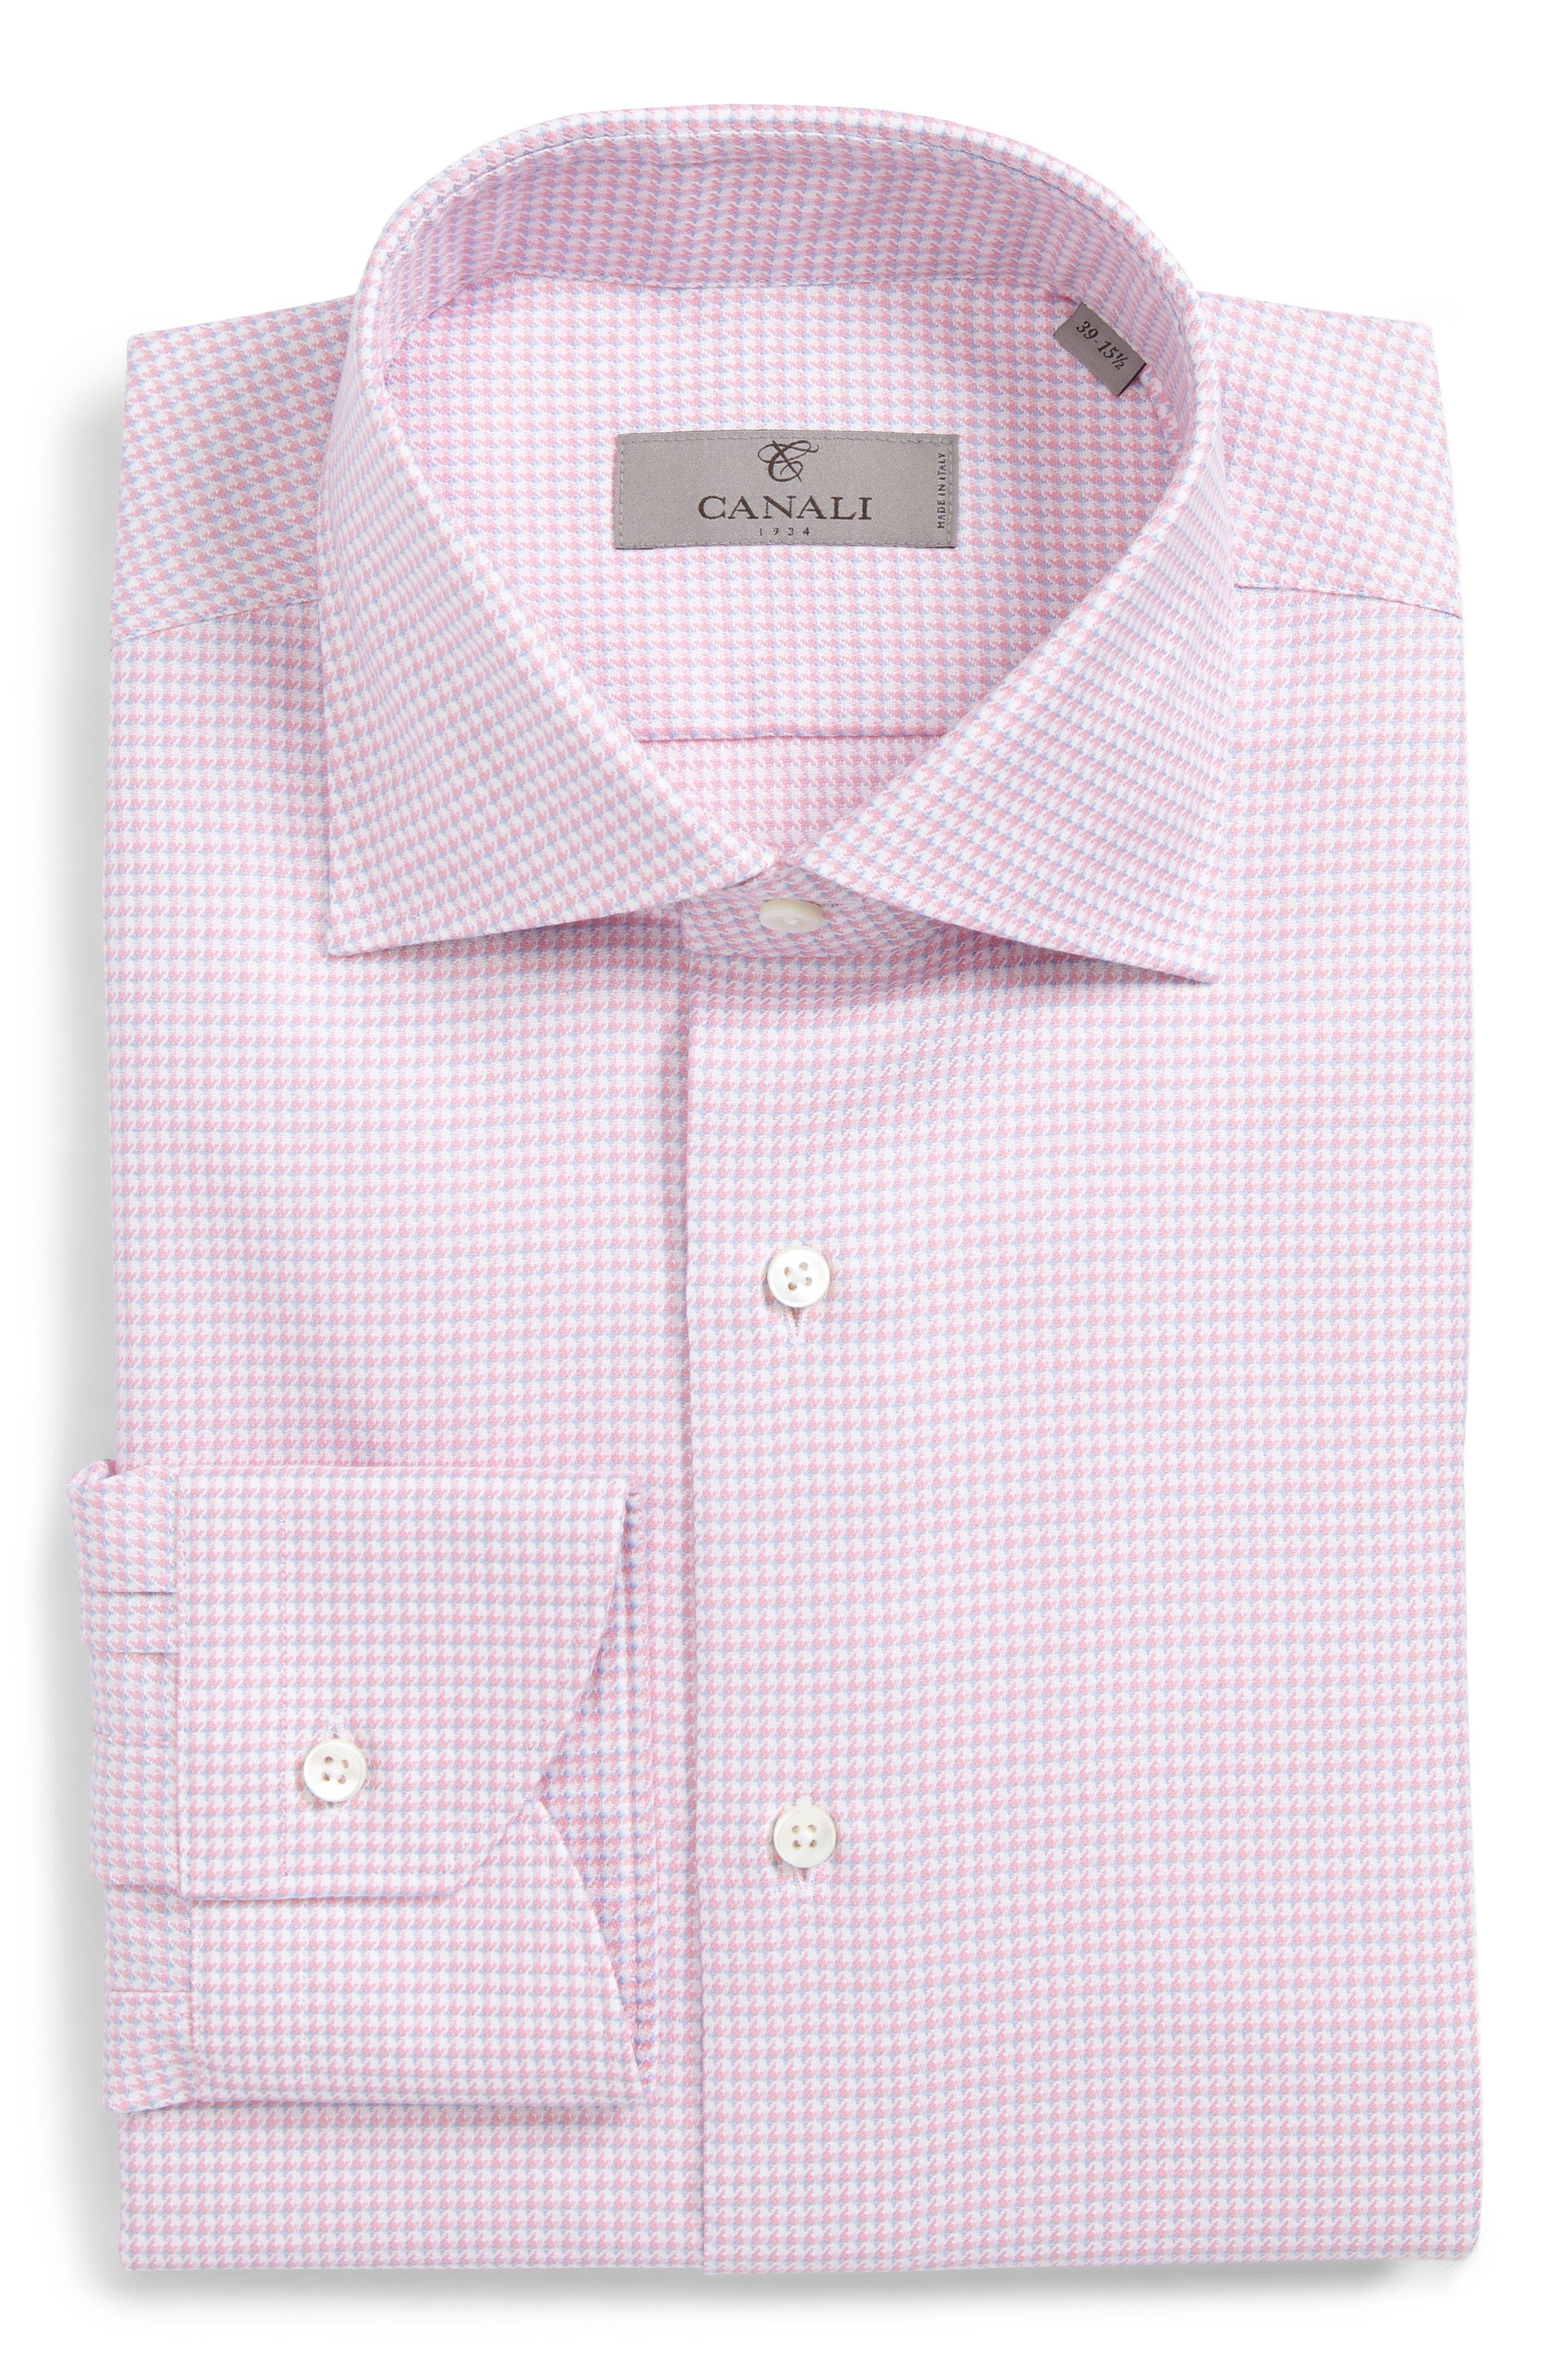 Regular Fit Houndstooth Dress Shirt,                             Main thumbnail 1, color,                             Pink